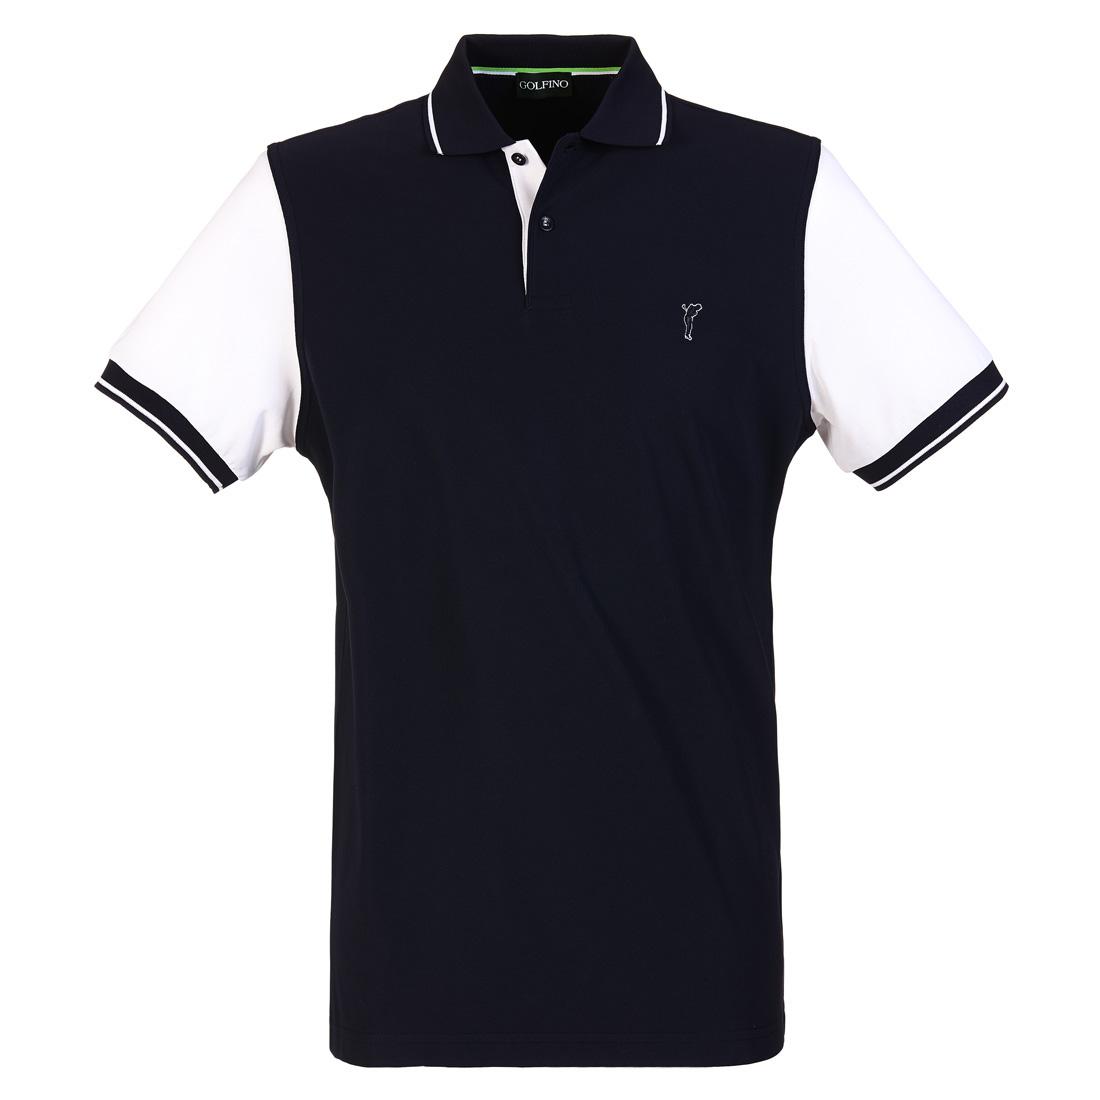 Extra Dry Poloshirt mit Kontrast Ärmeln